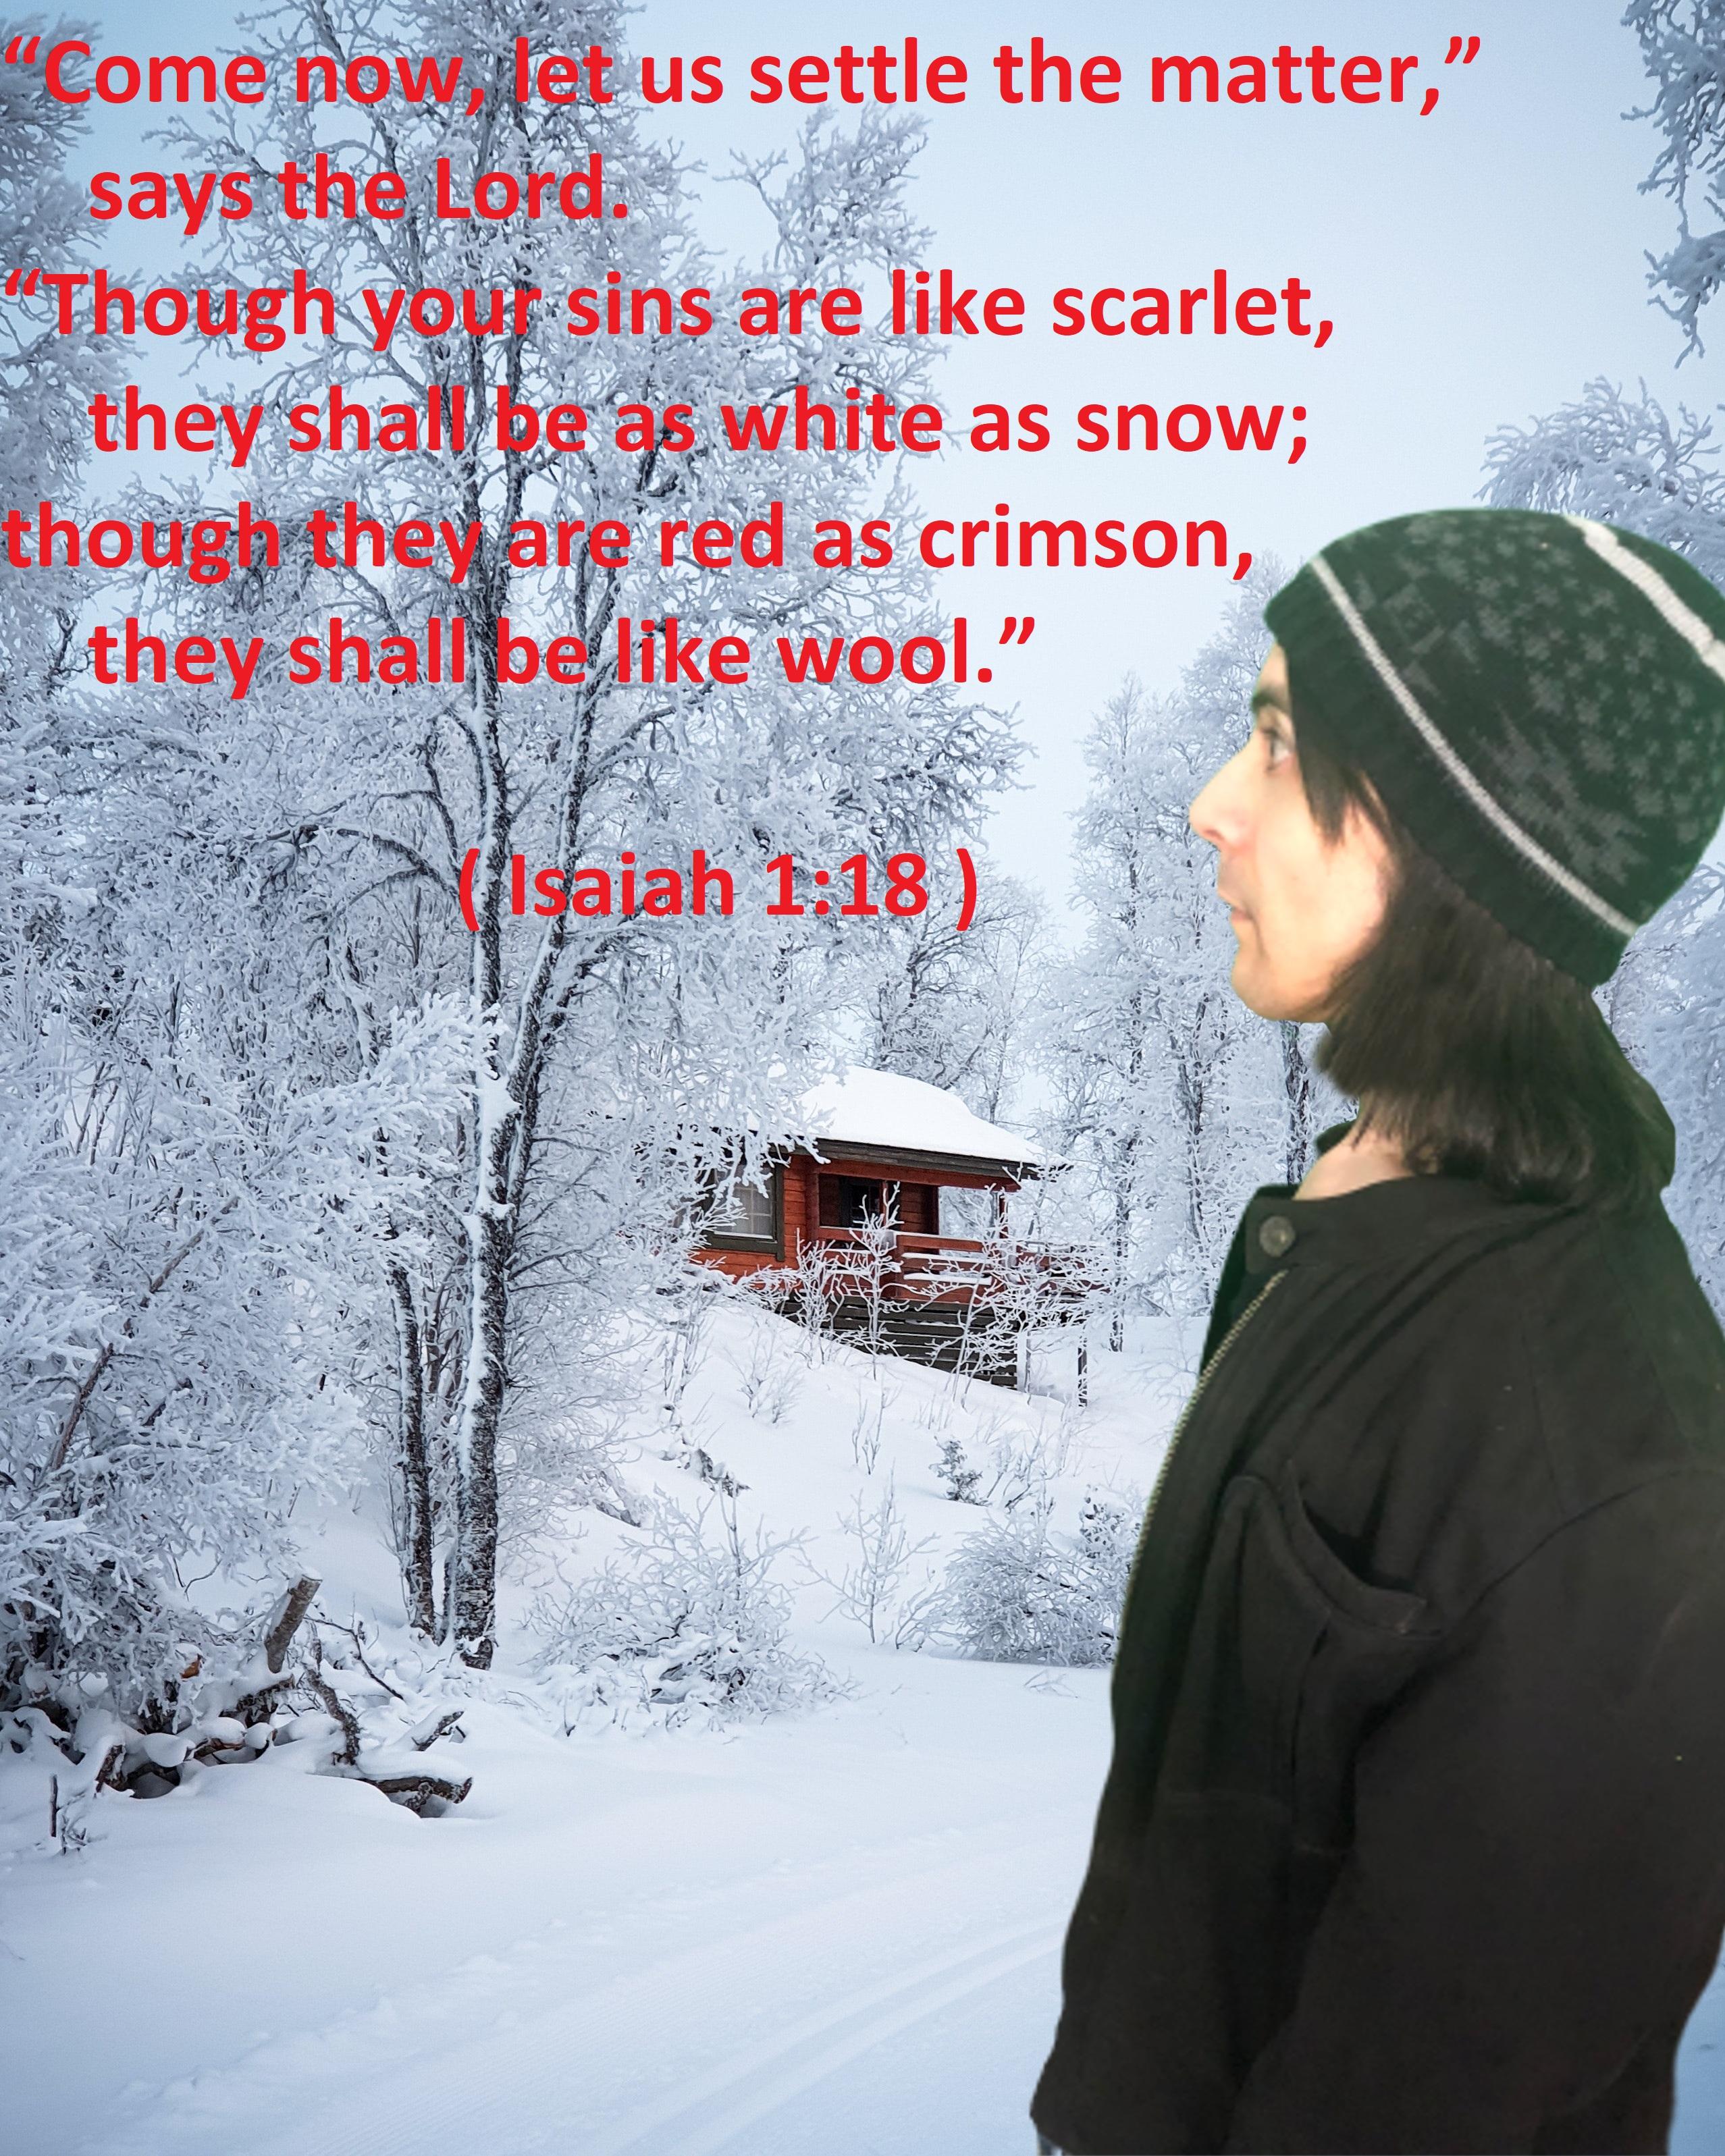 Motivational Bible verse about repentance